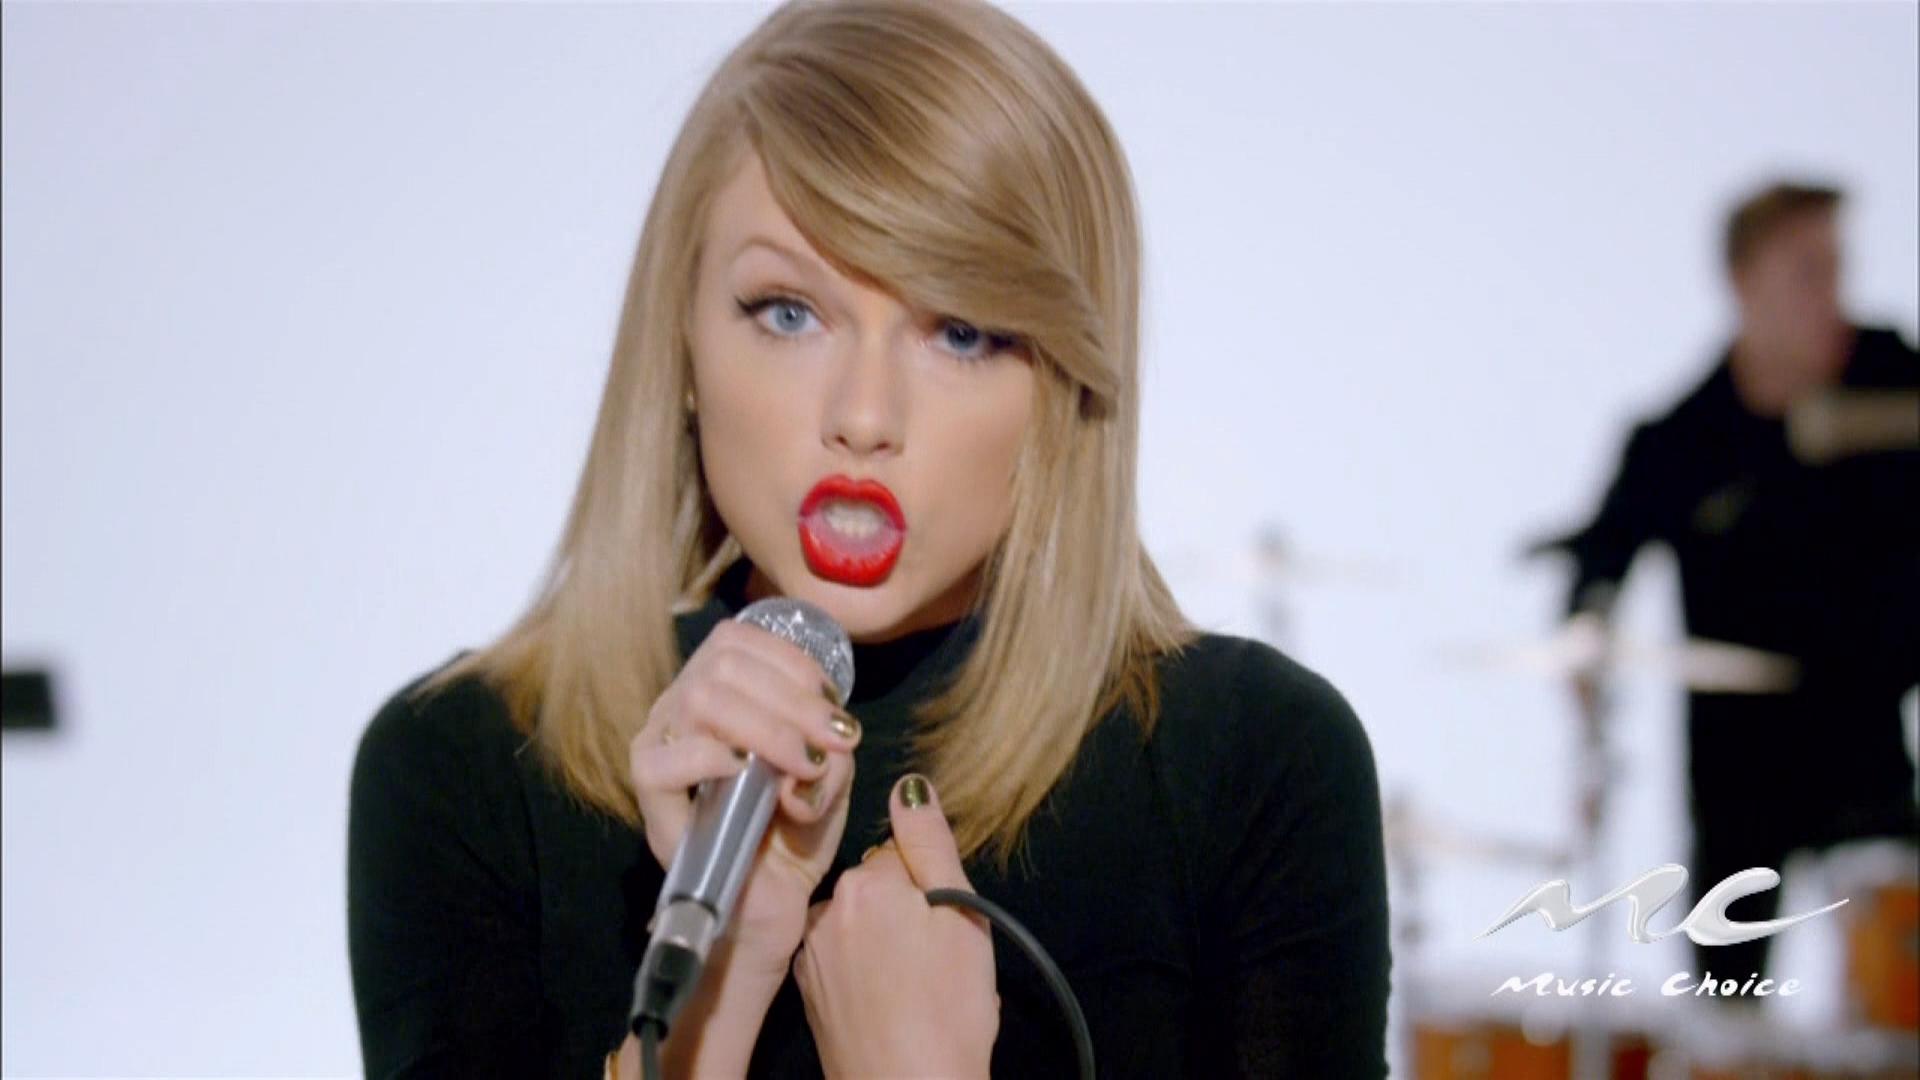 Taylor Swift - Shake It Off (Music Choice) 1080i HDTV ...